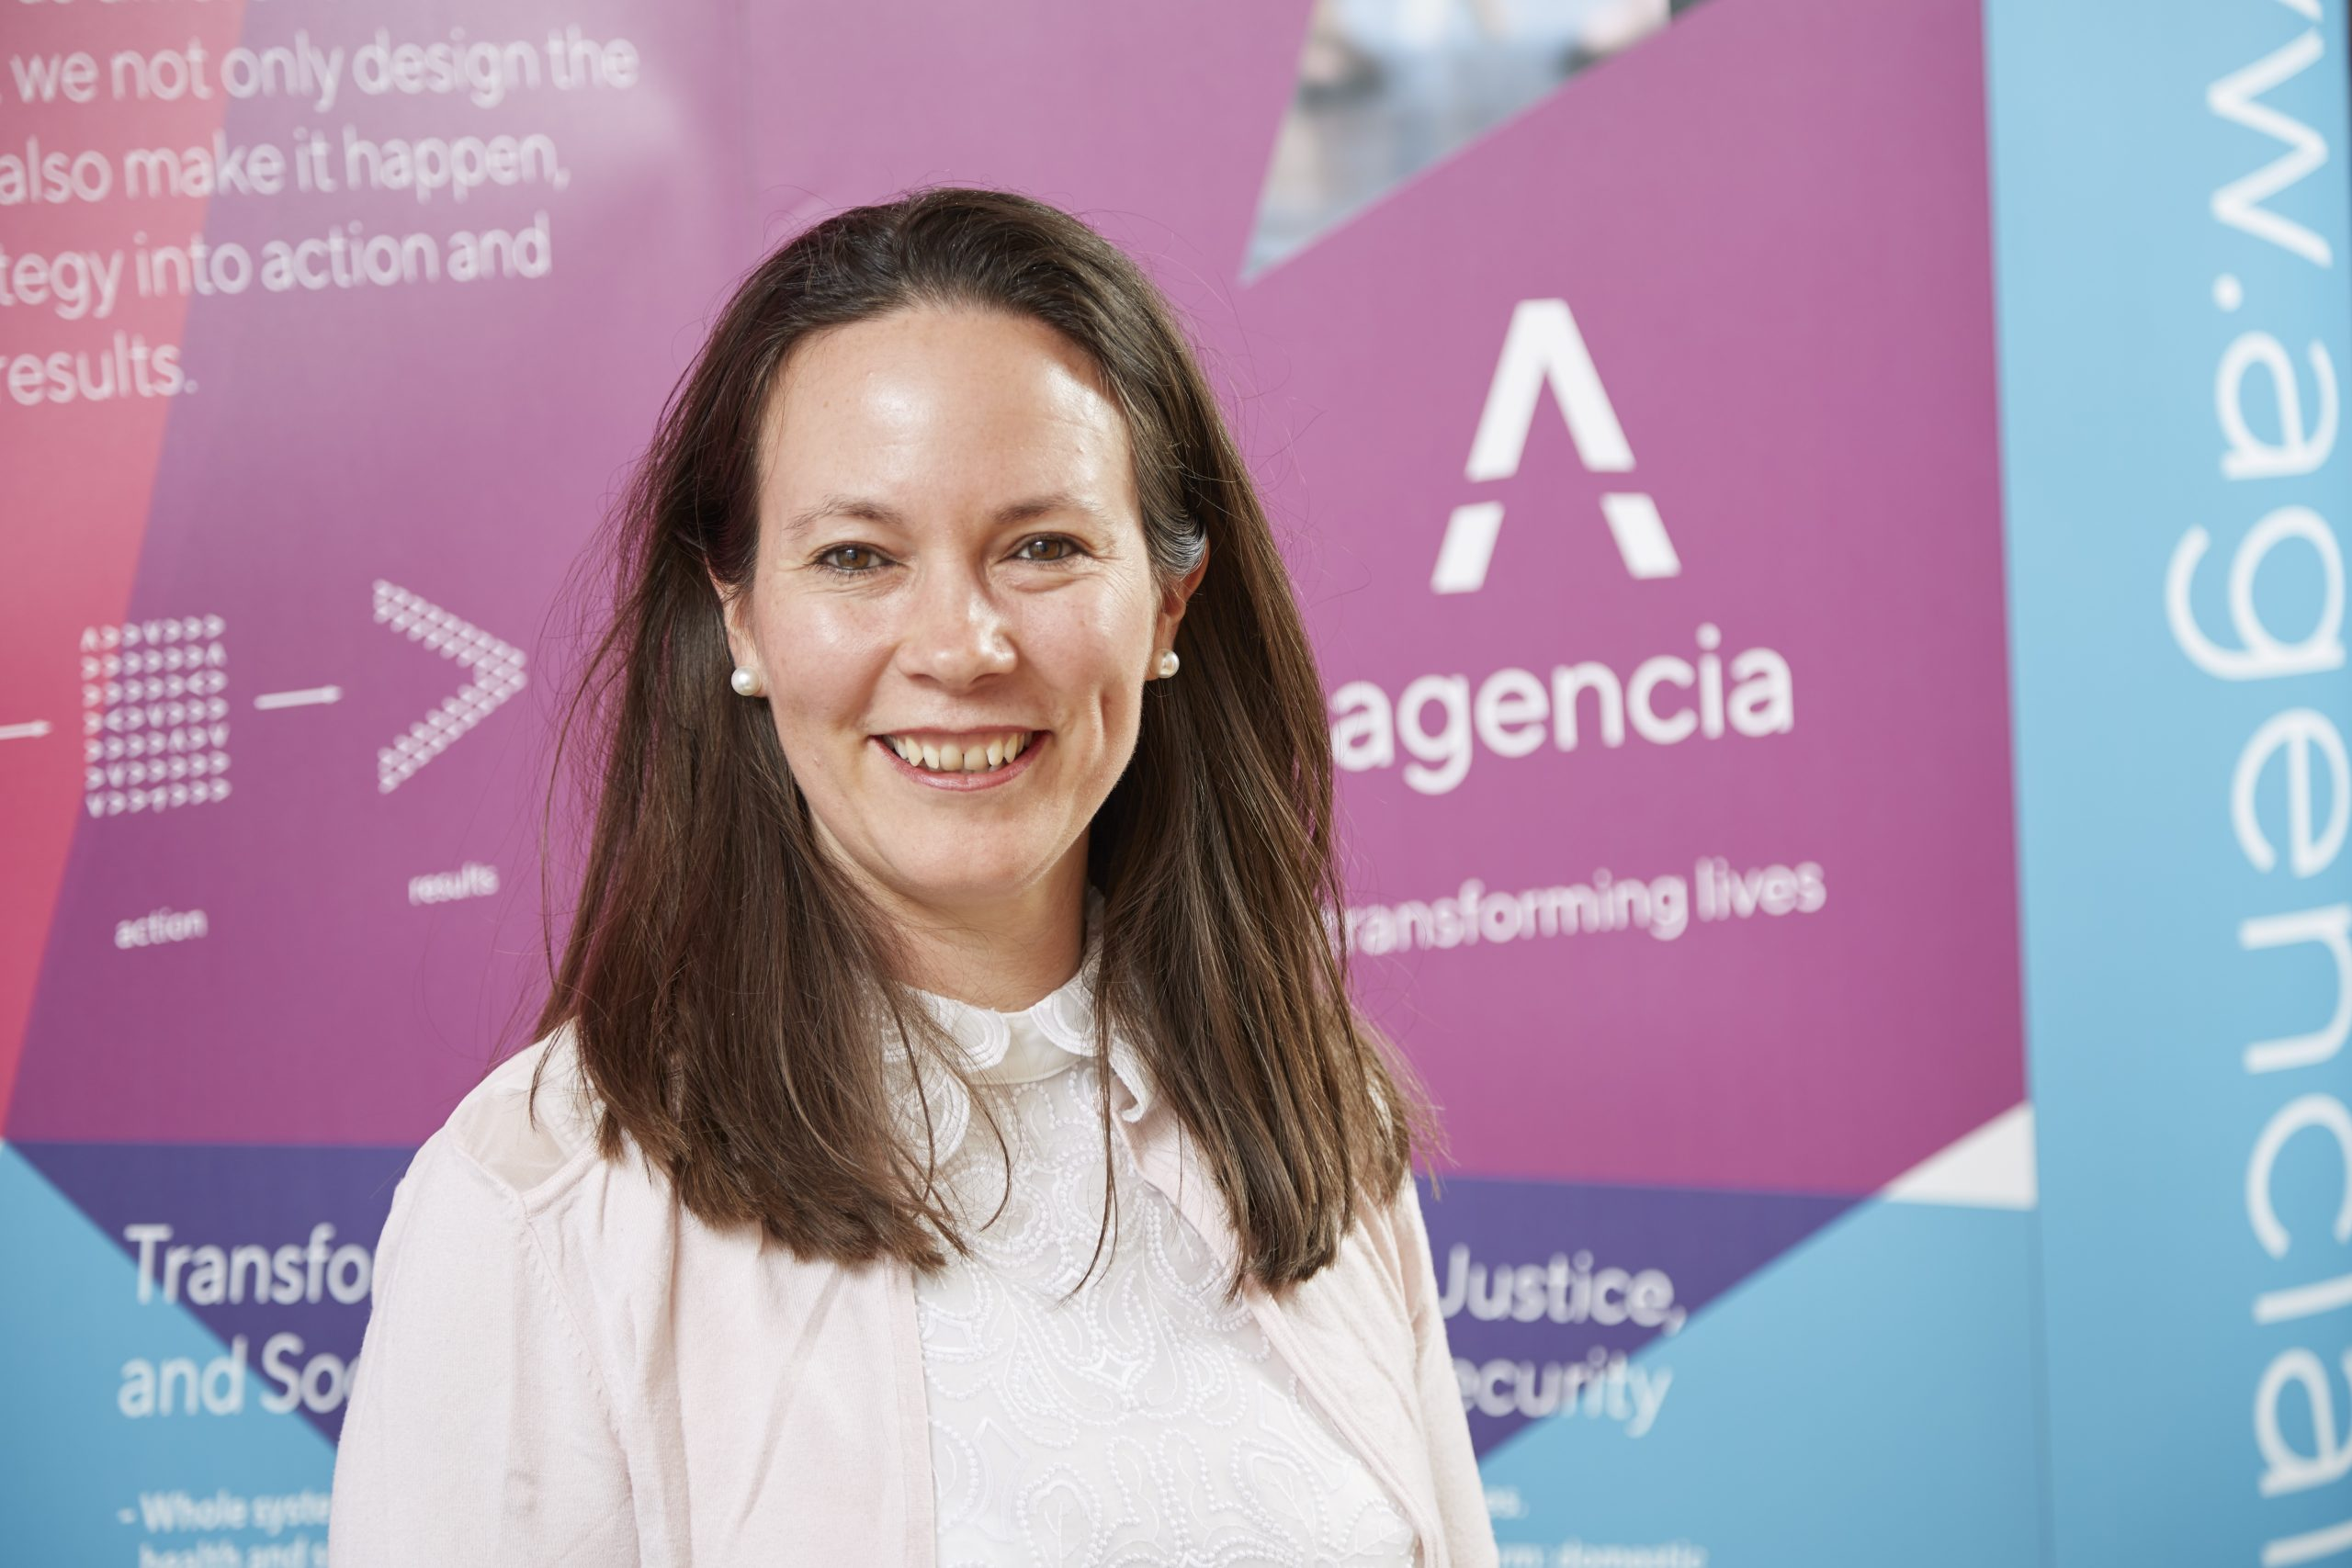 Helen Gibson, Managing Director of Agencia.